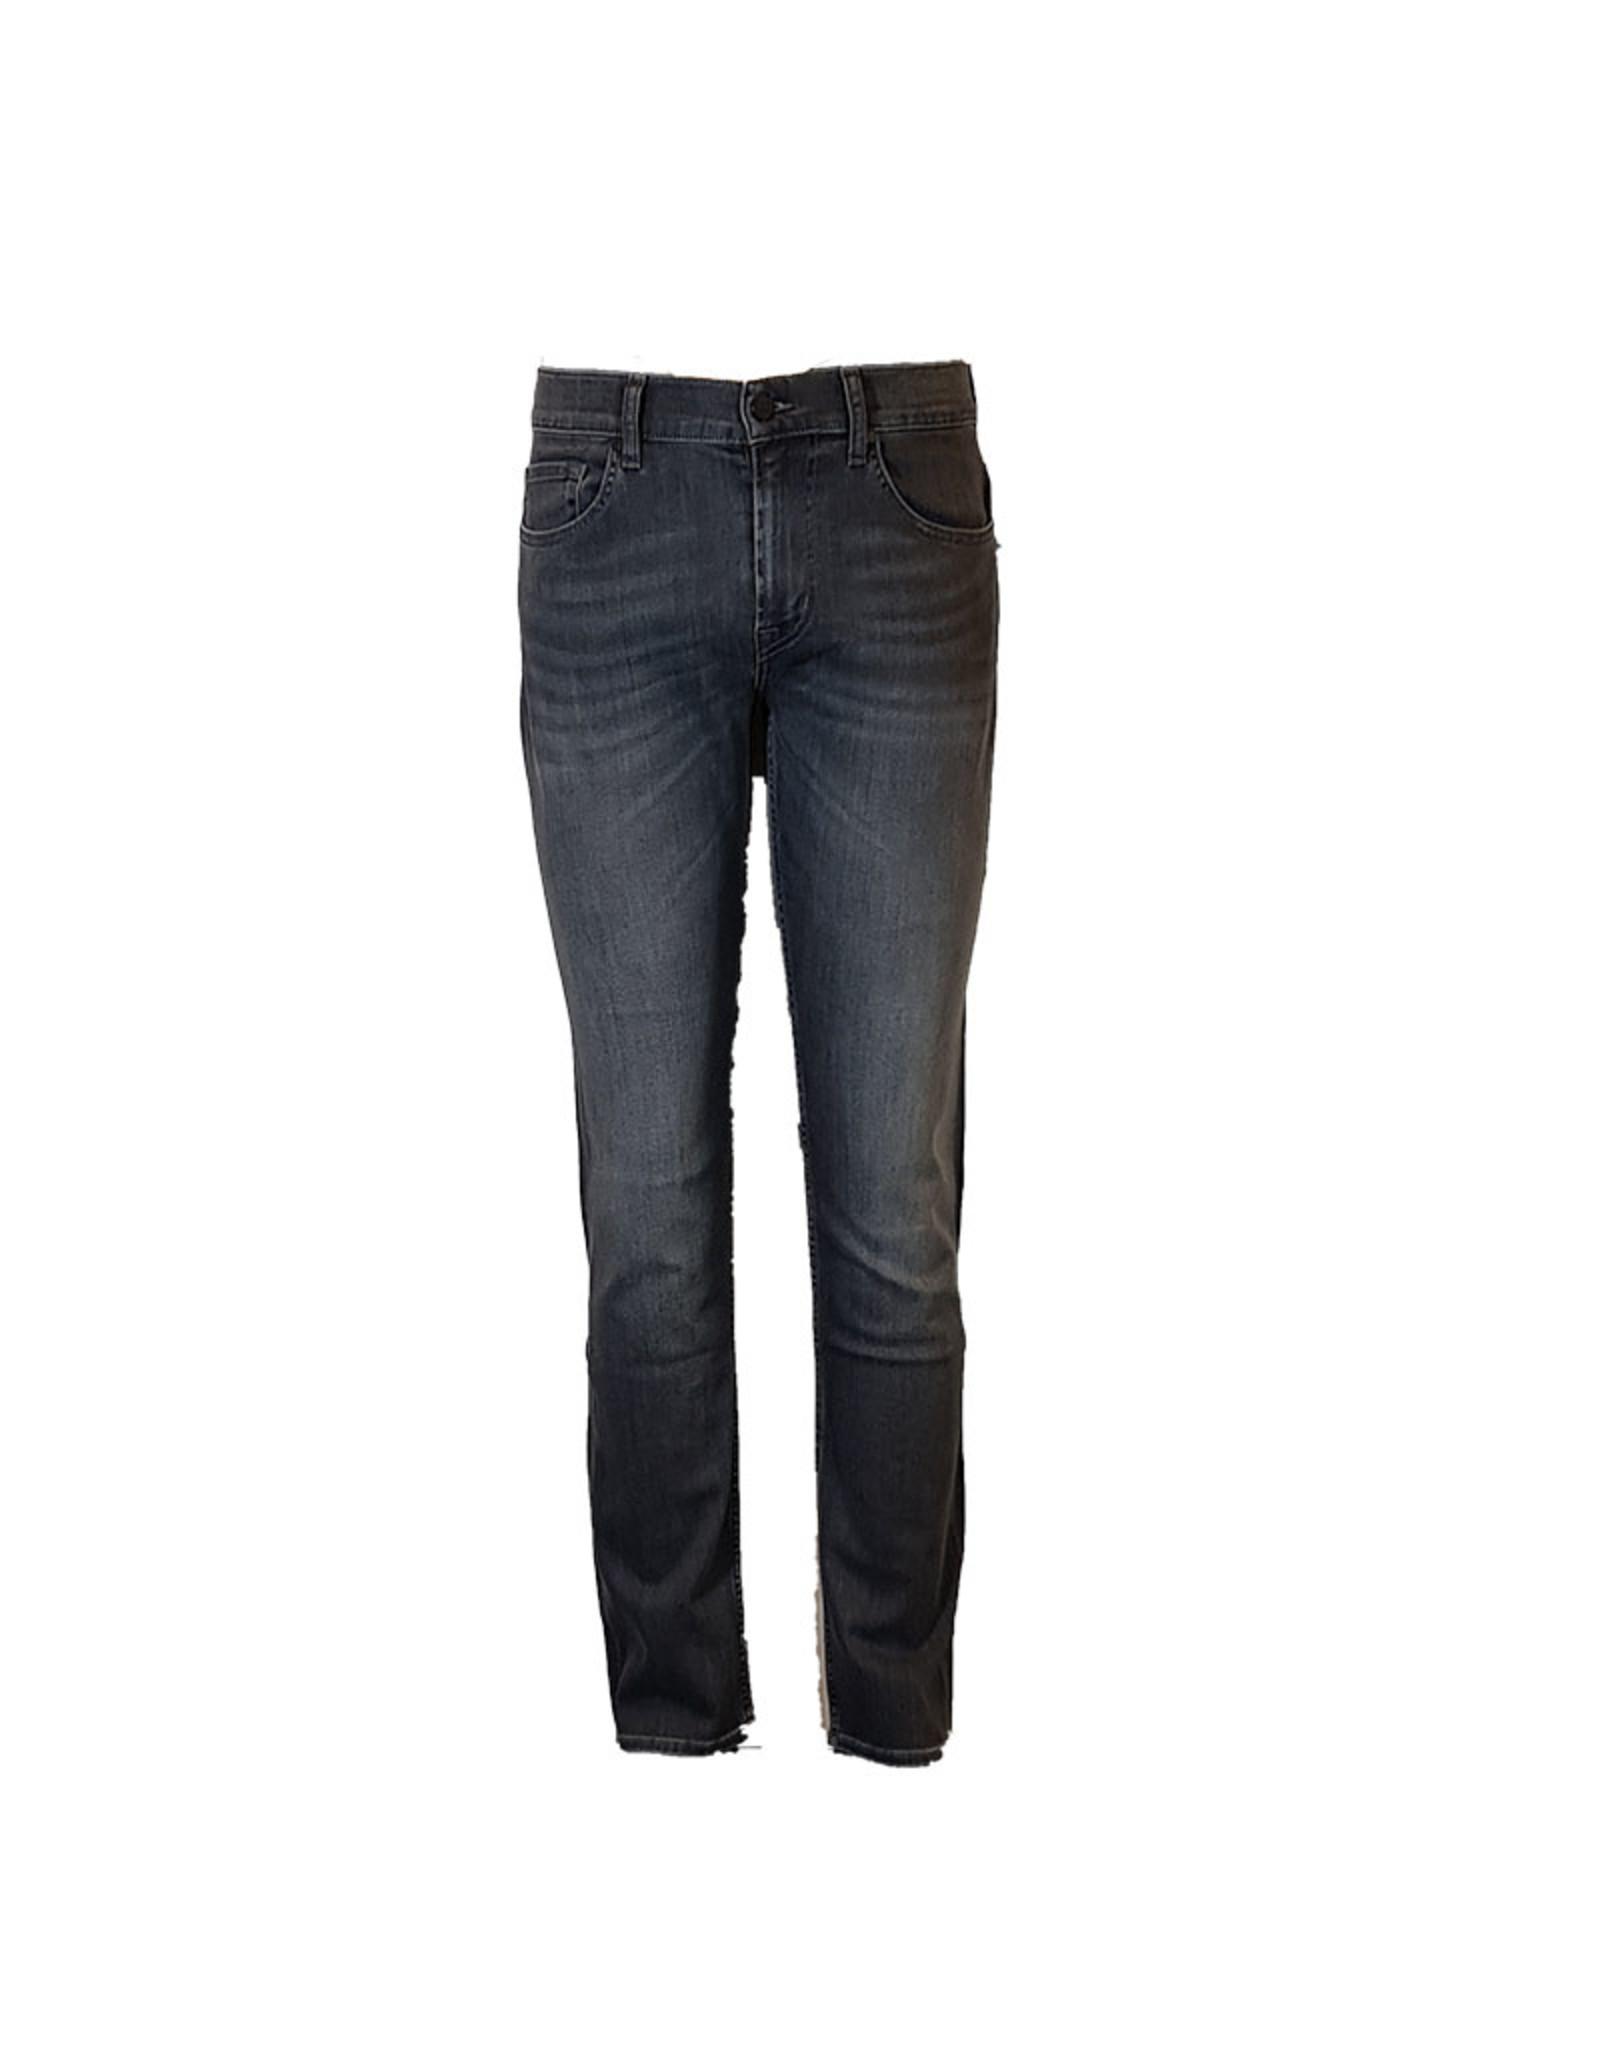 7 For All Mankind 7FAM jeans grijs Kayden JSMTR730PE